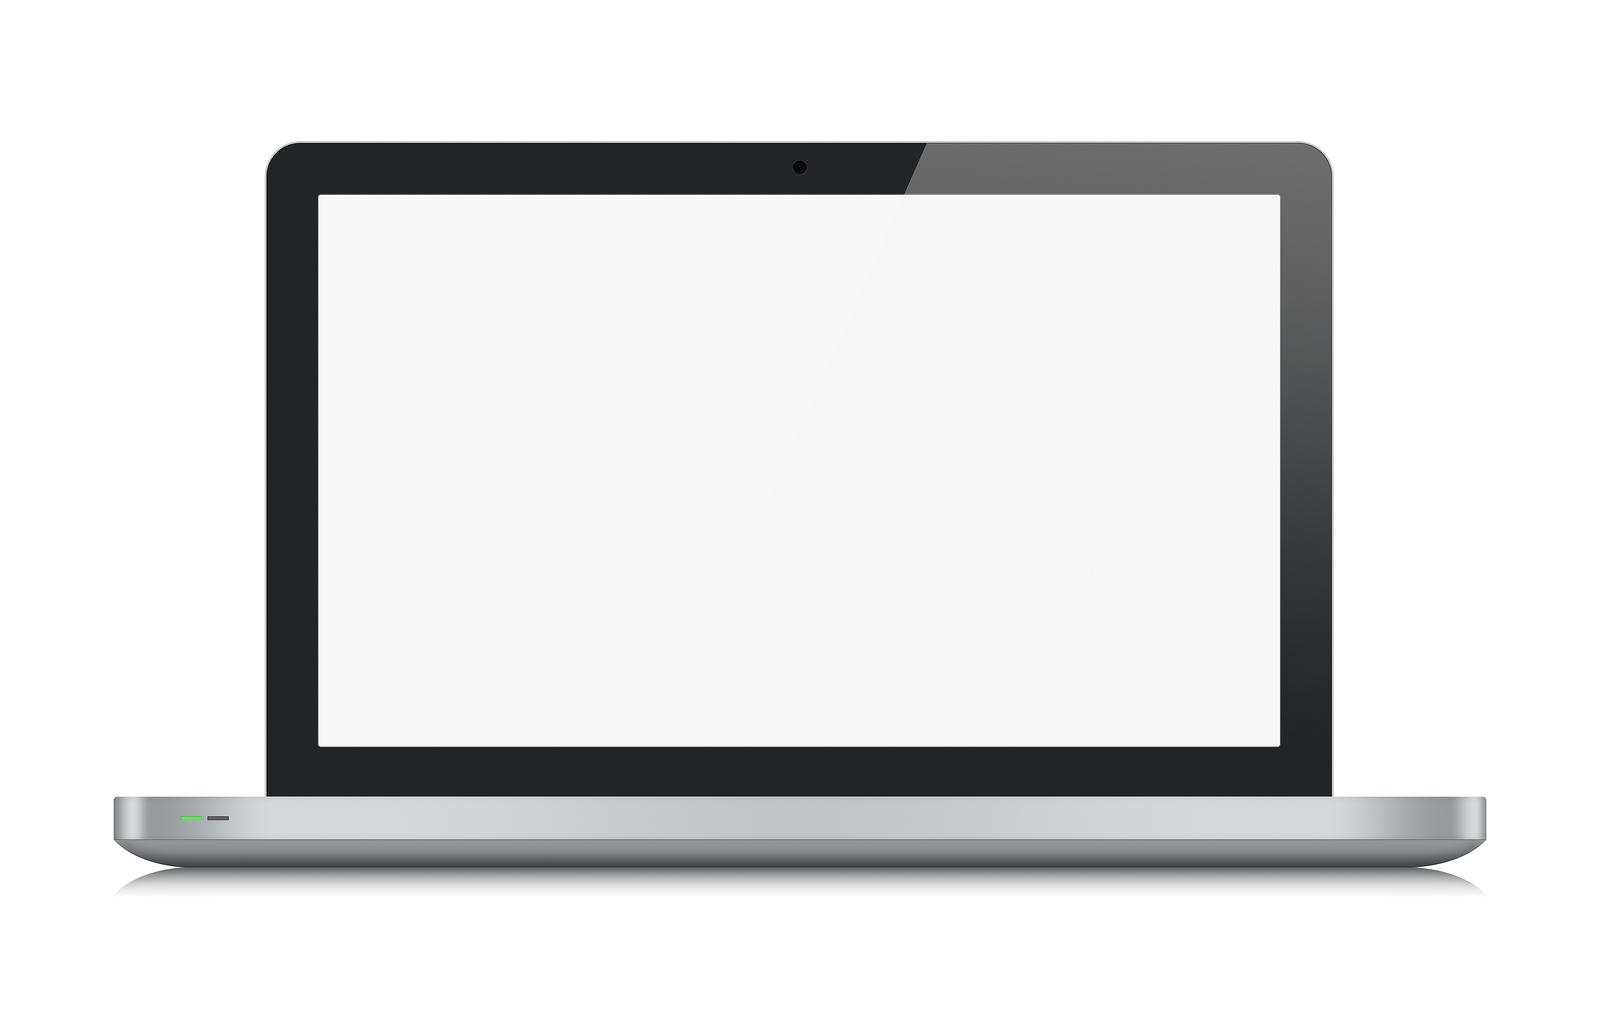 bigstock-Modern-Metallic-Laptop-Isolate-48340022